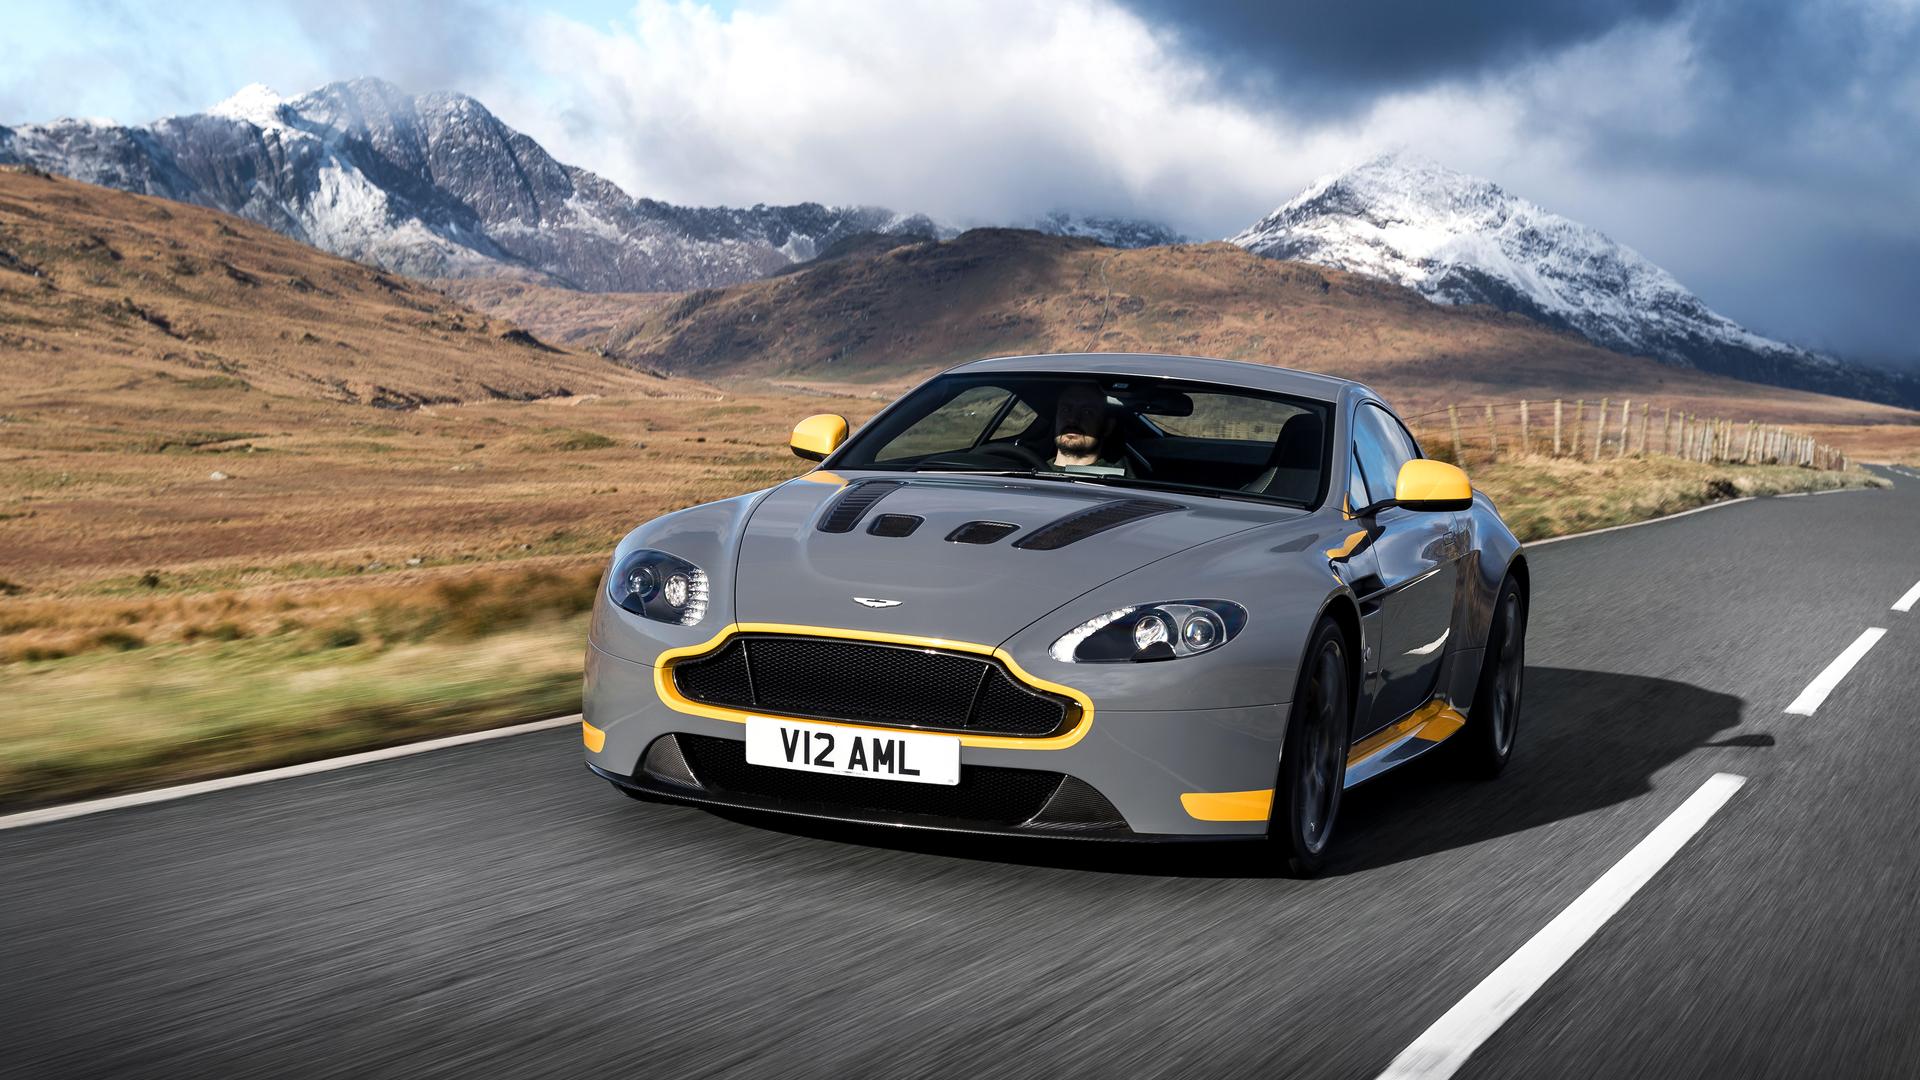 Purists Rejoice 2017 Aston Martin V12 Vantage S Gets Manual Box